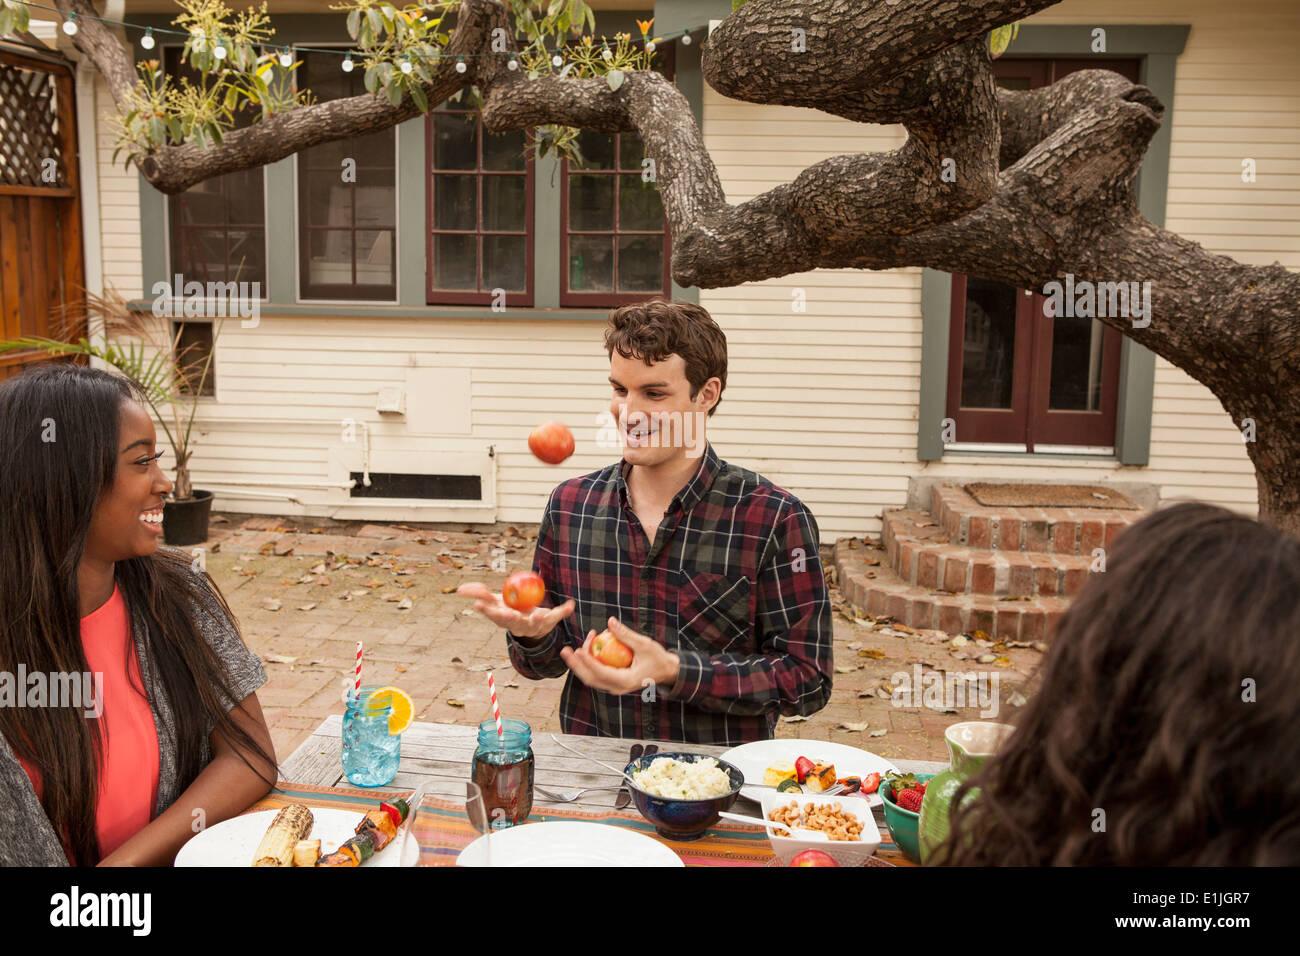 freunde an tisch grill essen teilen menschen jonglieren obst stockfoto bild 69864459 alamy. Black Bedroom Furniture Sets. Home Design Ideas